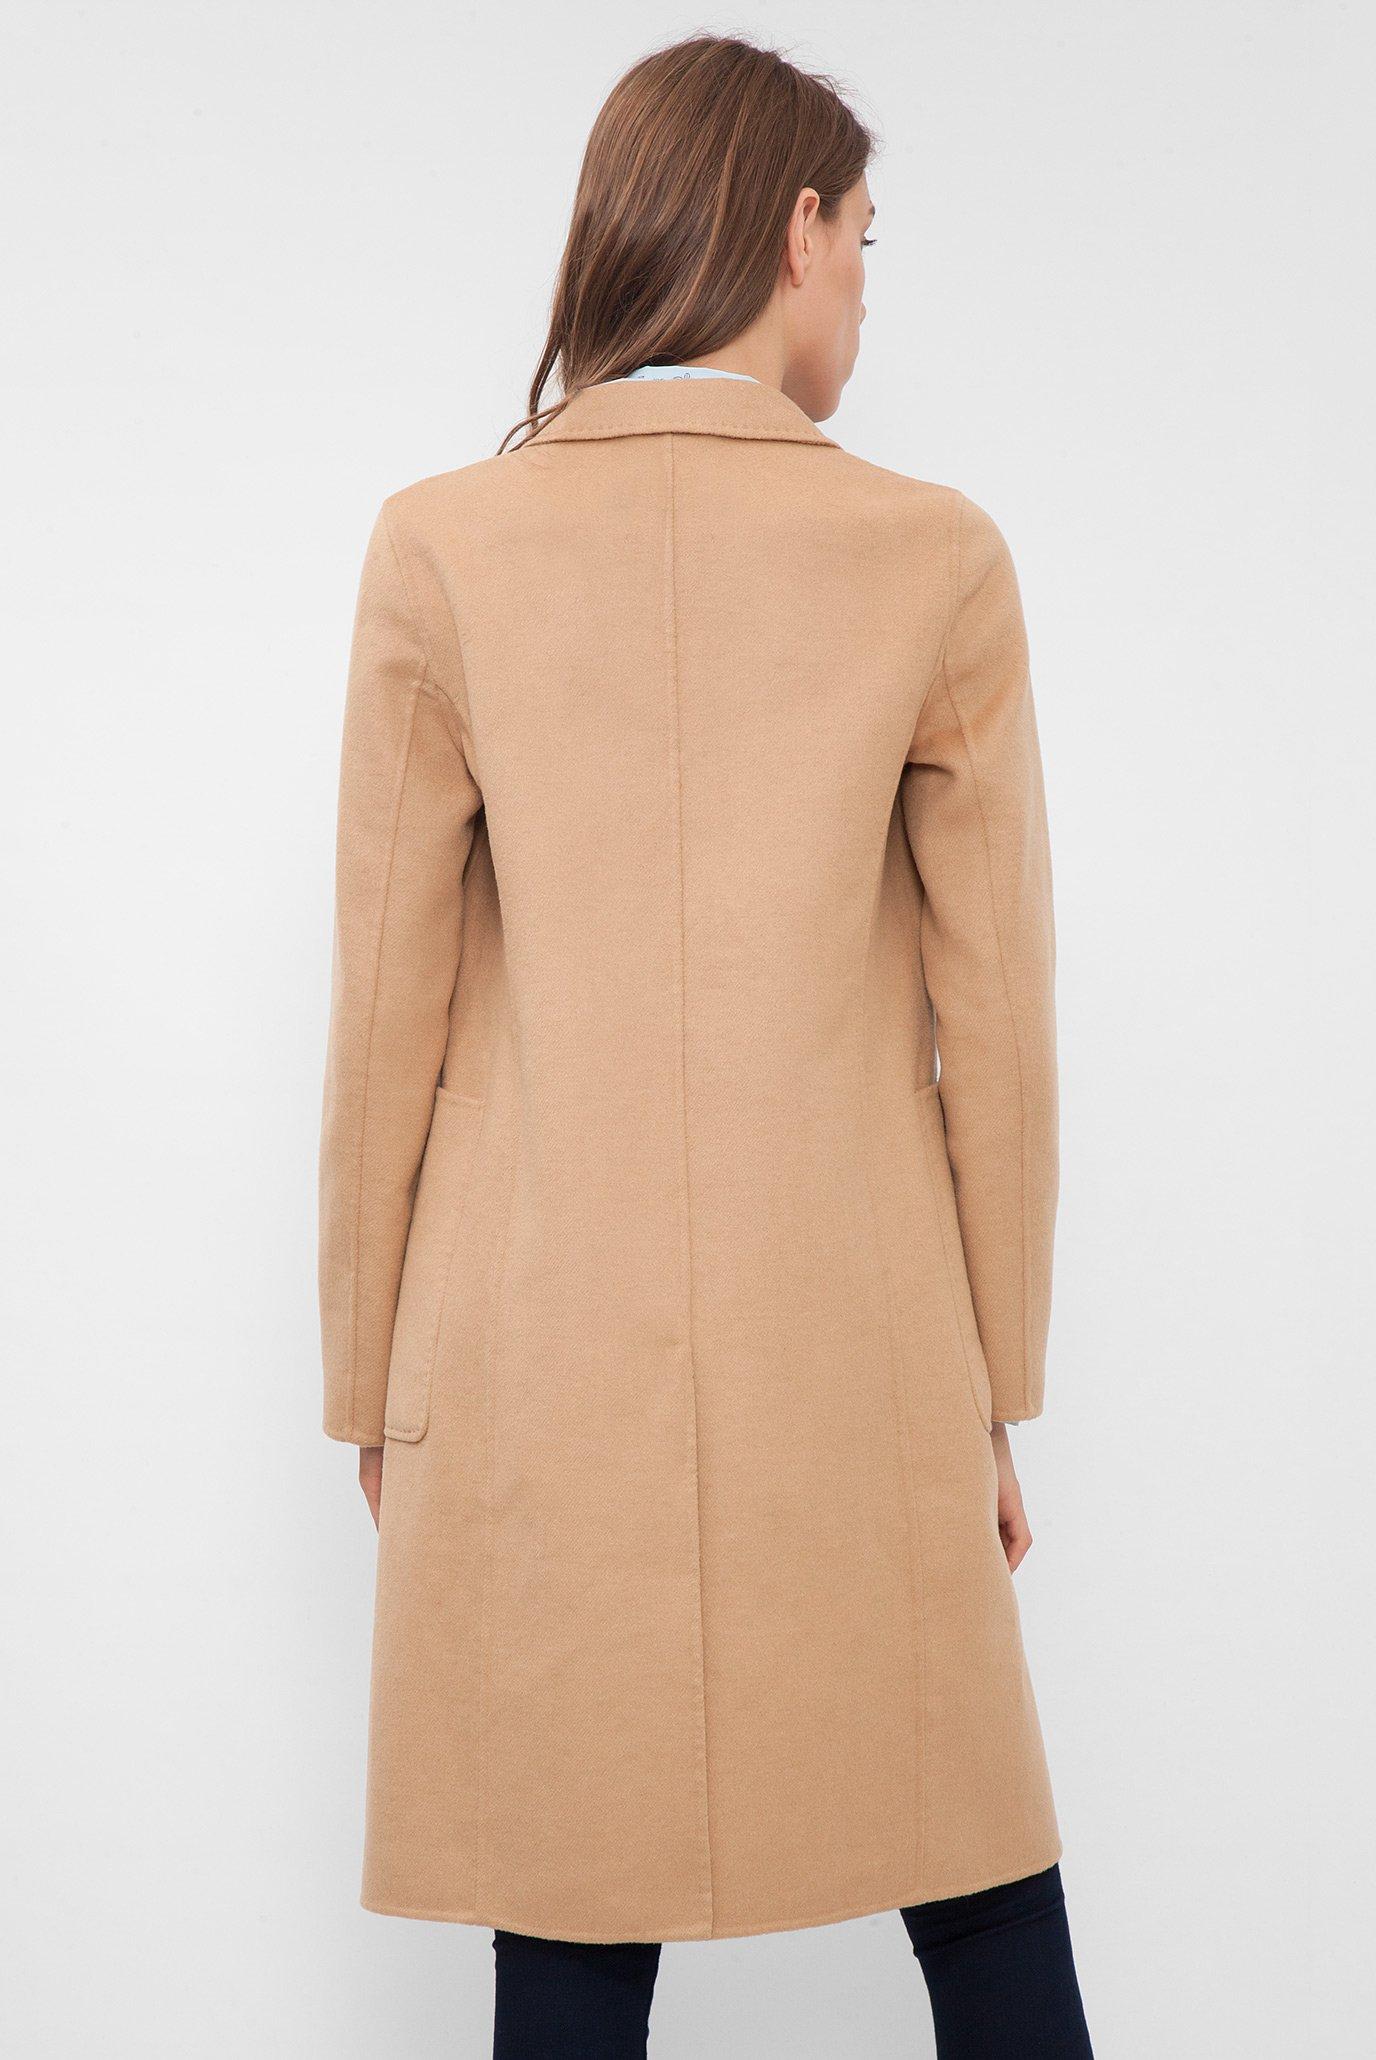 4e5a3e67b7a Купить Женское бежевое пальто Tommy Hilfiger Tommy Hilfiger WW0WW19231 –  Киев